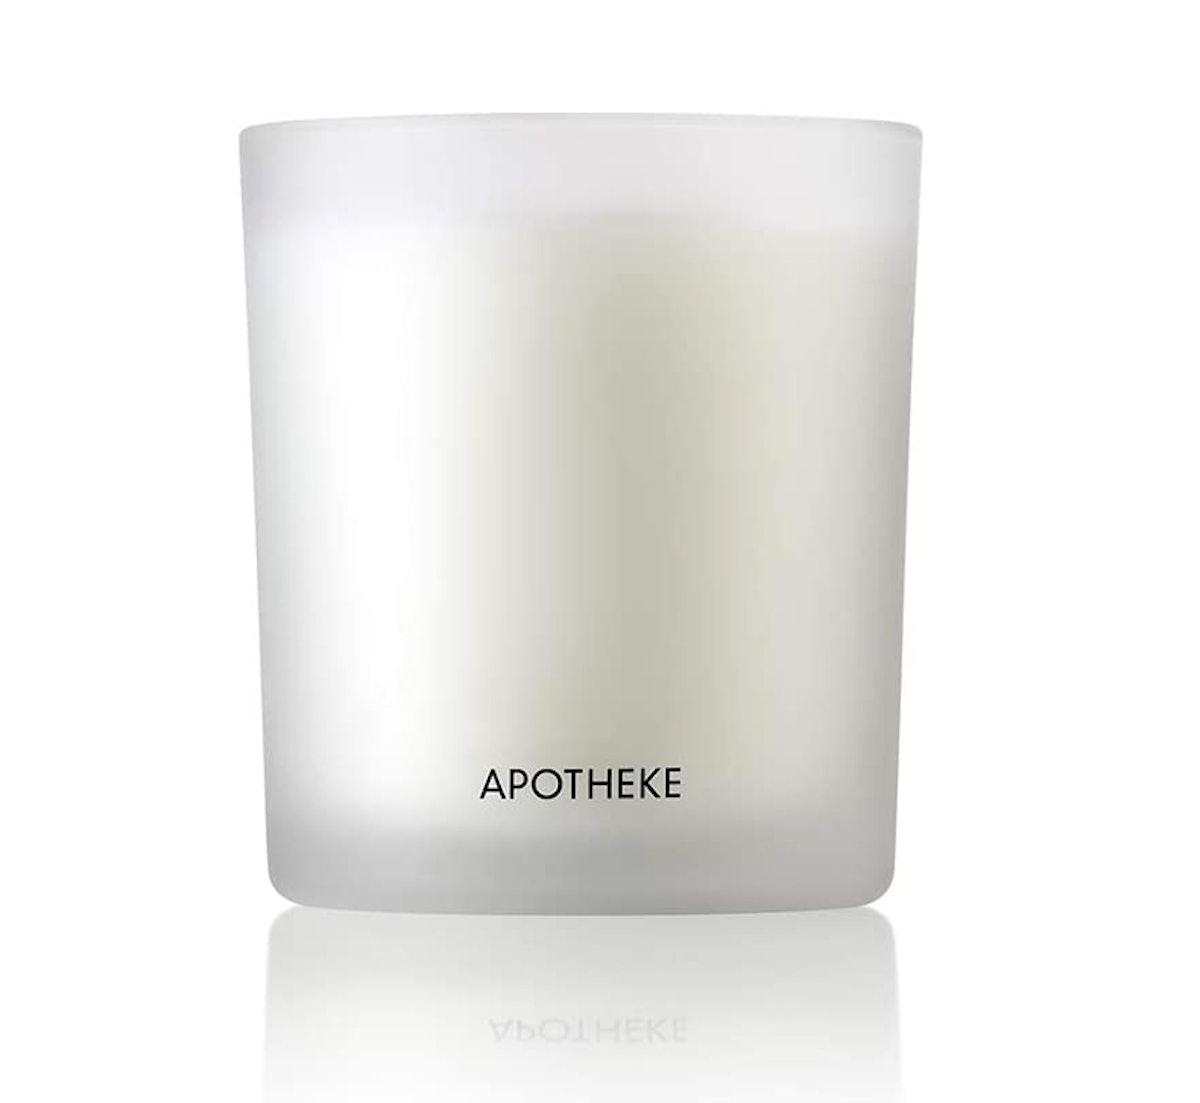 APOTHEKE Luxury Scented Jar Candle